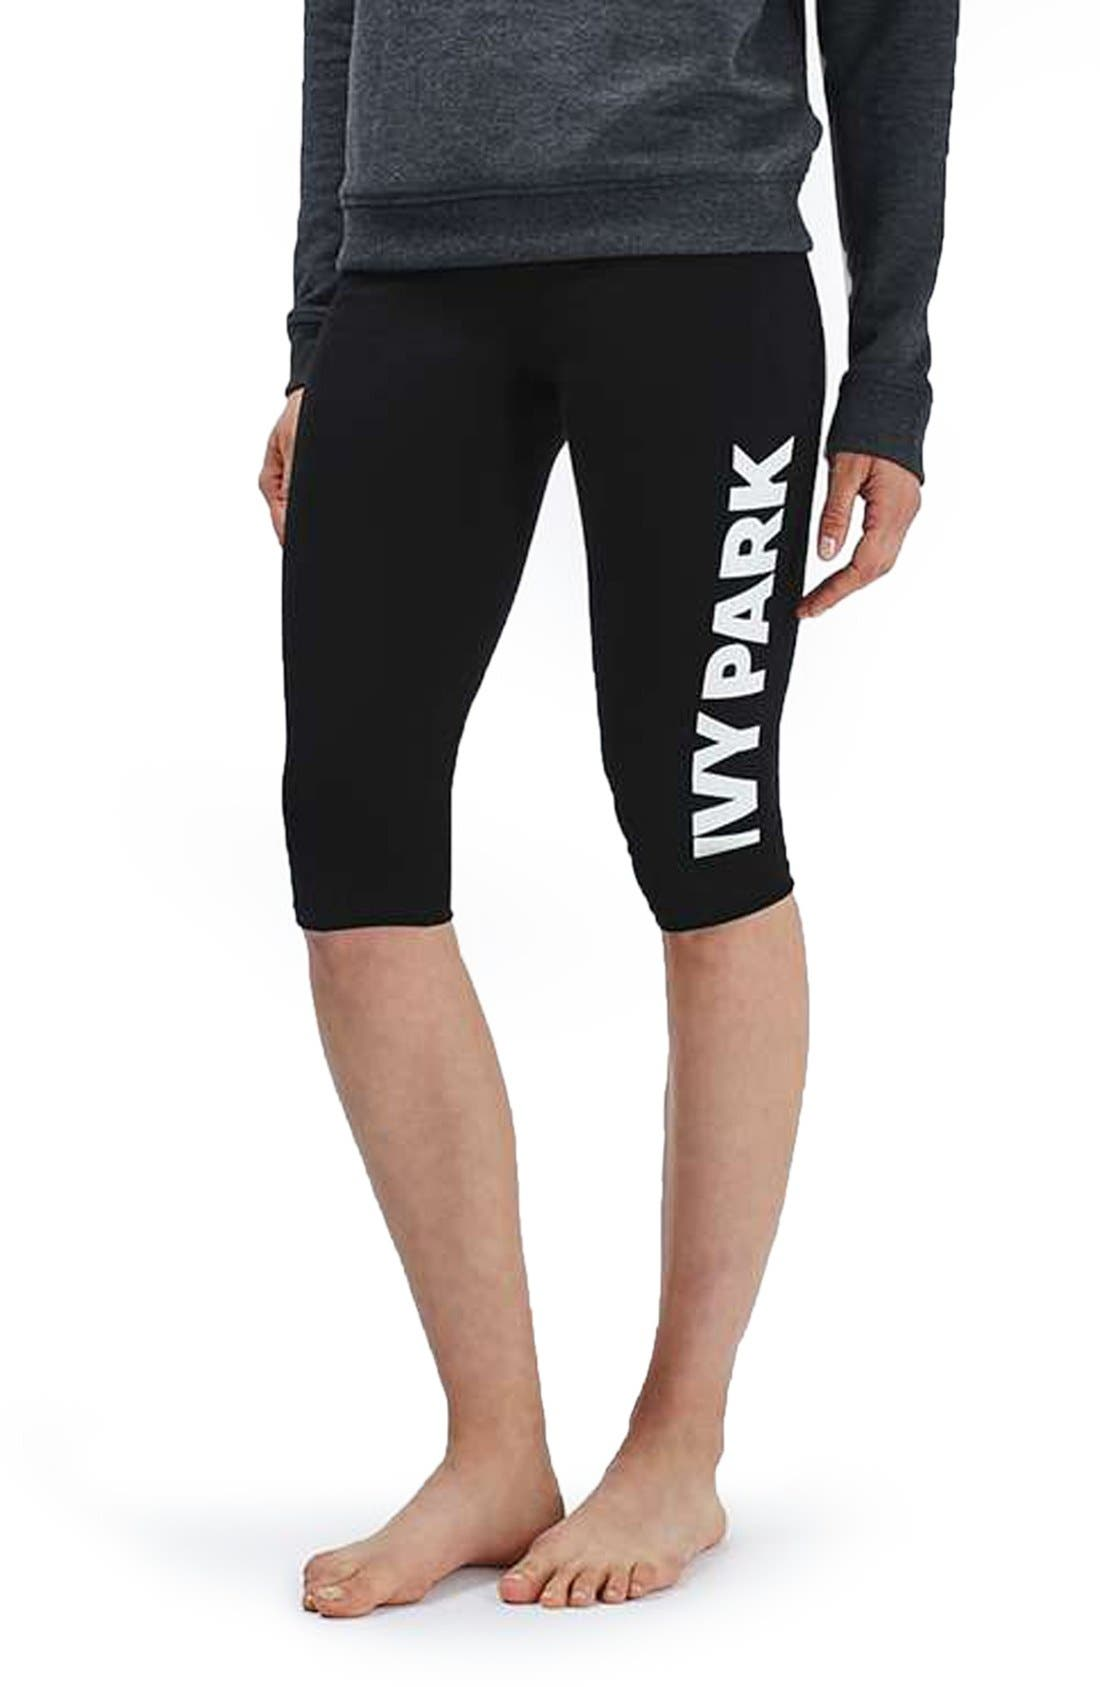 Main Image - IVY PARK® Logo Capri Leggings